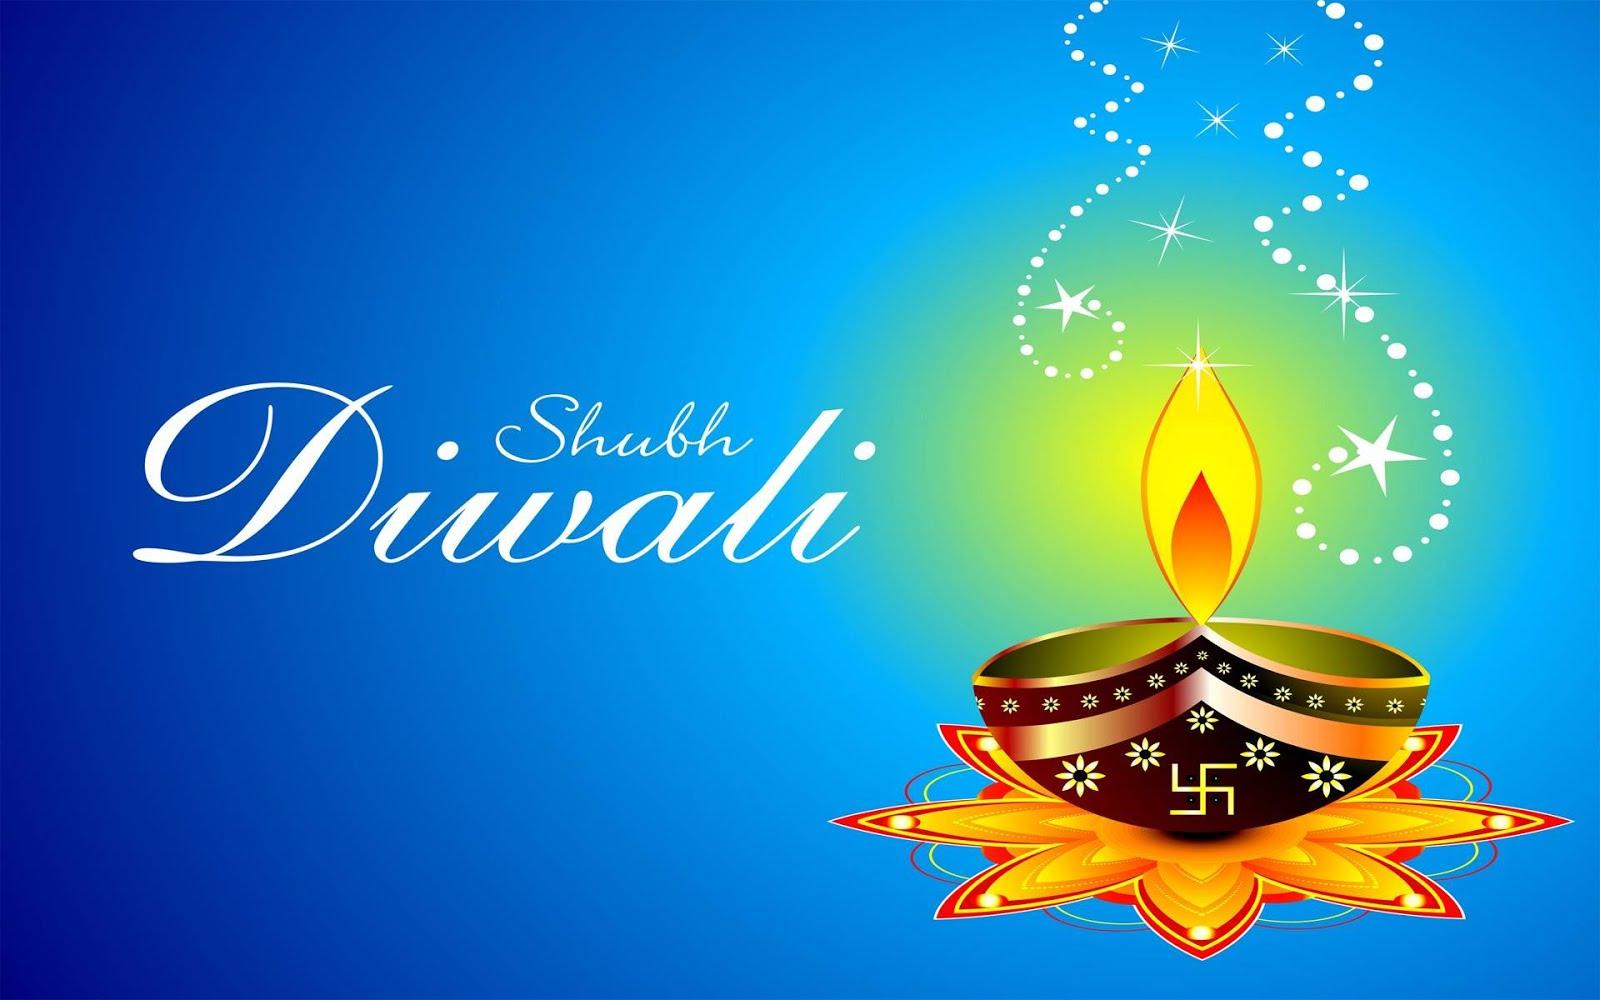 Happy diwali diwali wishes sms greetings whatsapp facebook happy diwali diwali wishes sms greetings whatsapp facebook status in hindi english and hinglish m4hsunfo